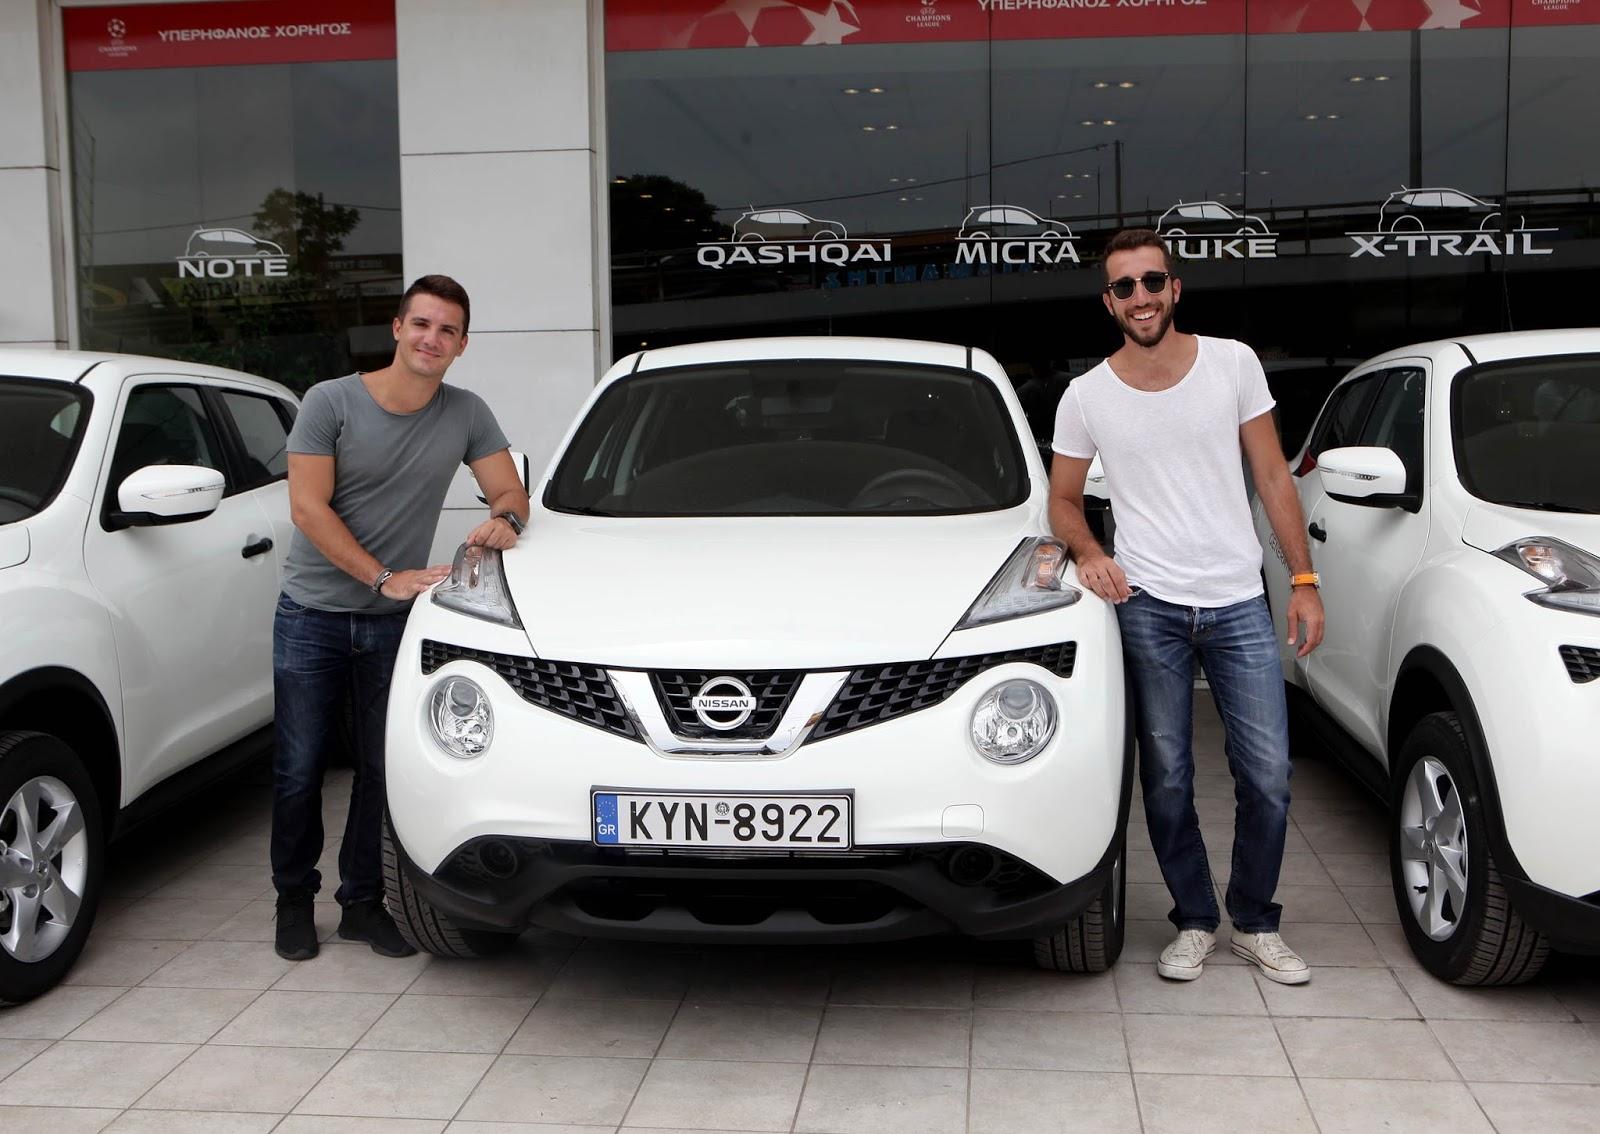 IMG 6155 Η Nissan βραβεύει με αυτοκίνητα του νικητές του GENERATION N ! Events, Future, Innovation, Nissan